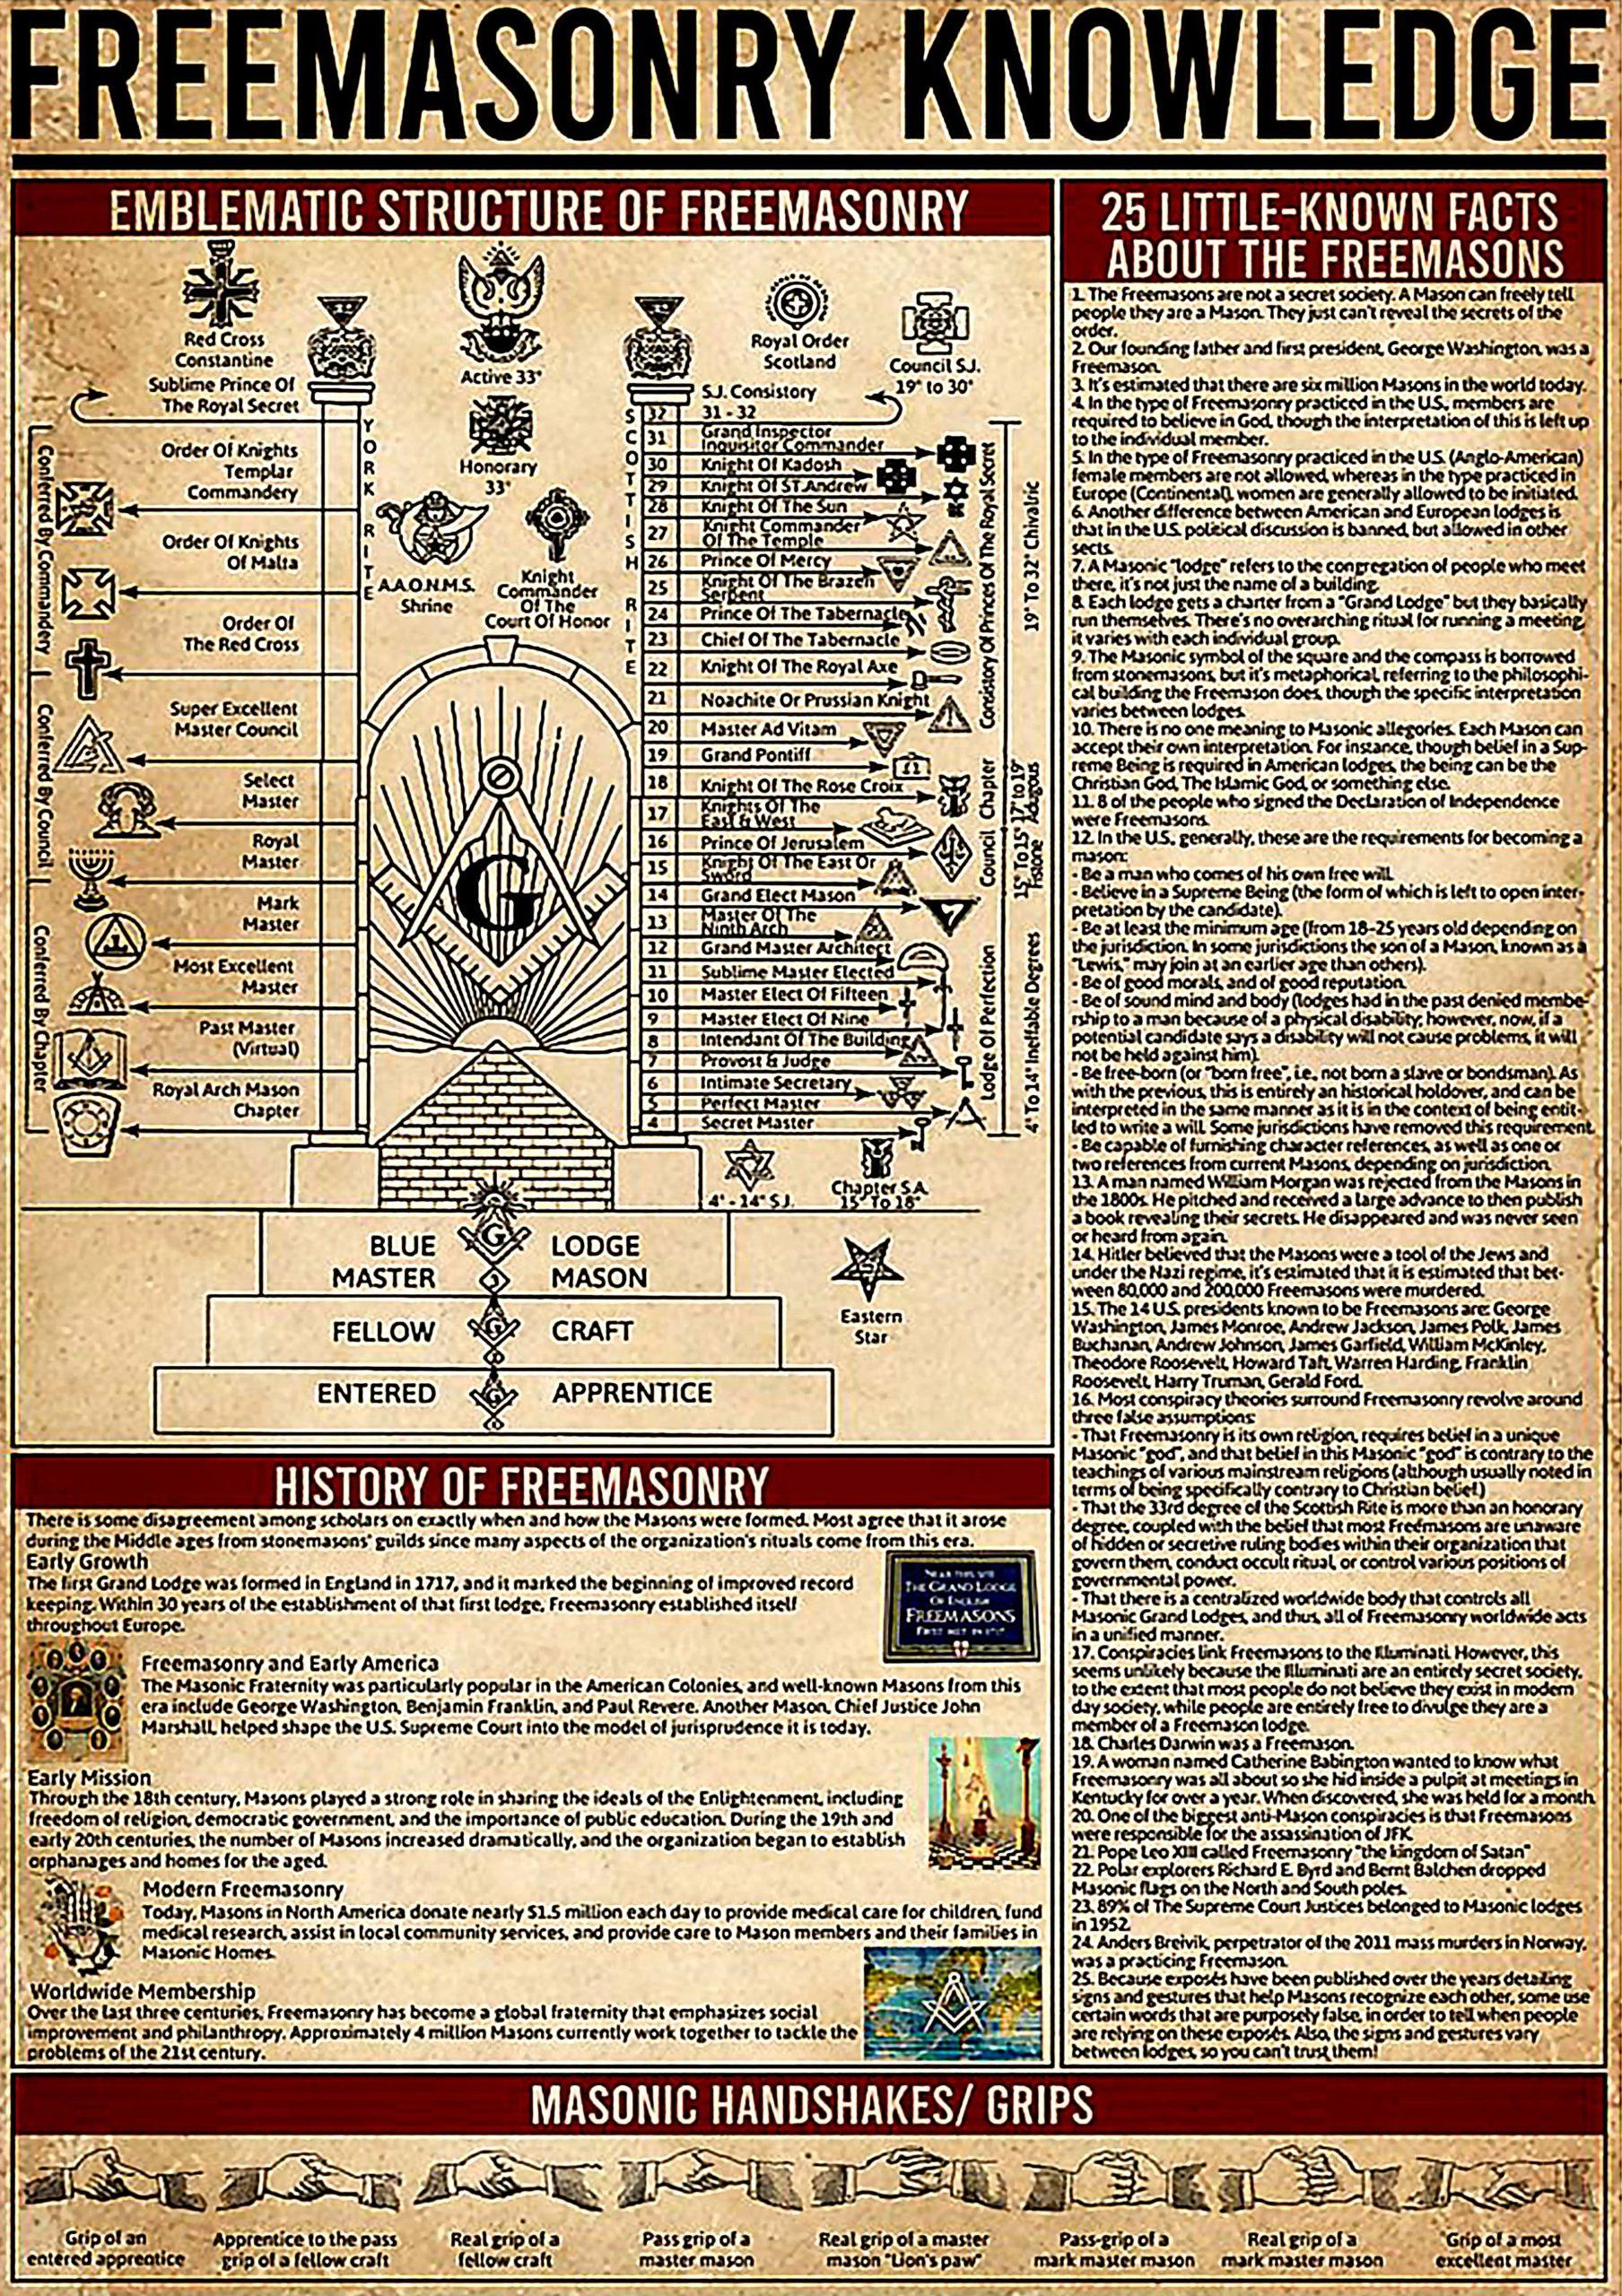 vintage freemasonry knowledge poster 1 - Copy (2)